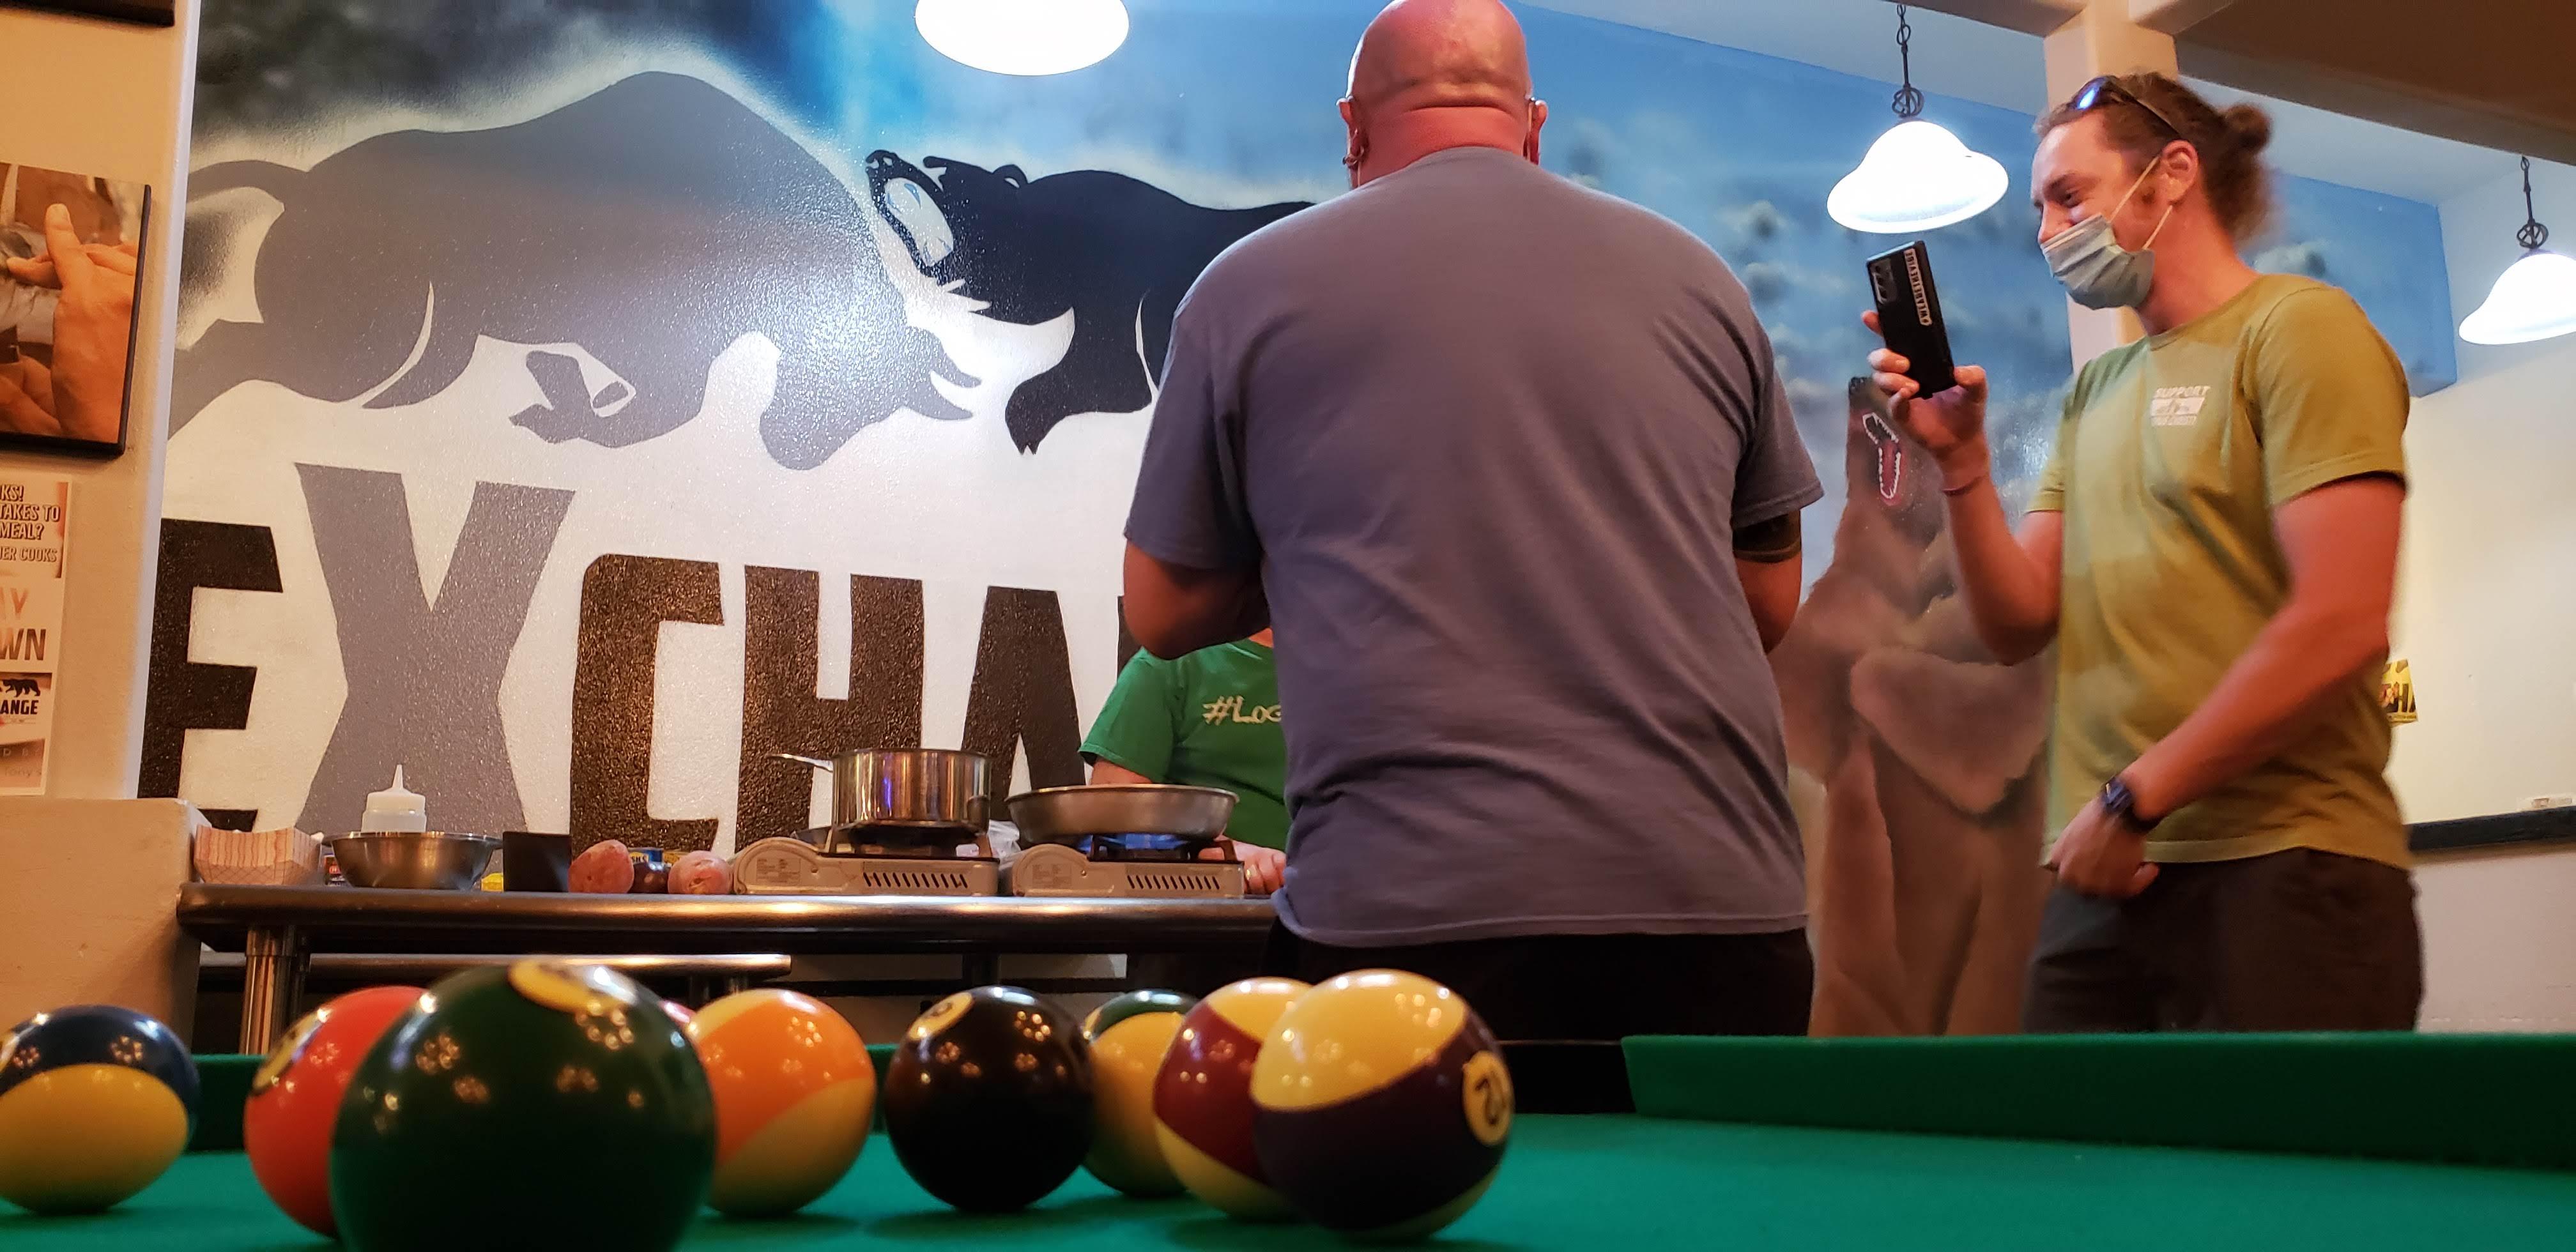 Thursday Throwdown:           A Look Inside Corpus Christi's Very Own Food Competition